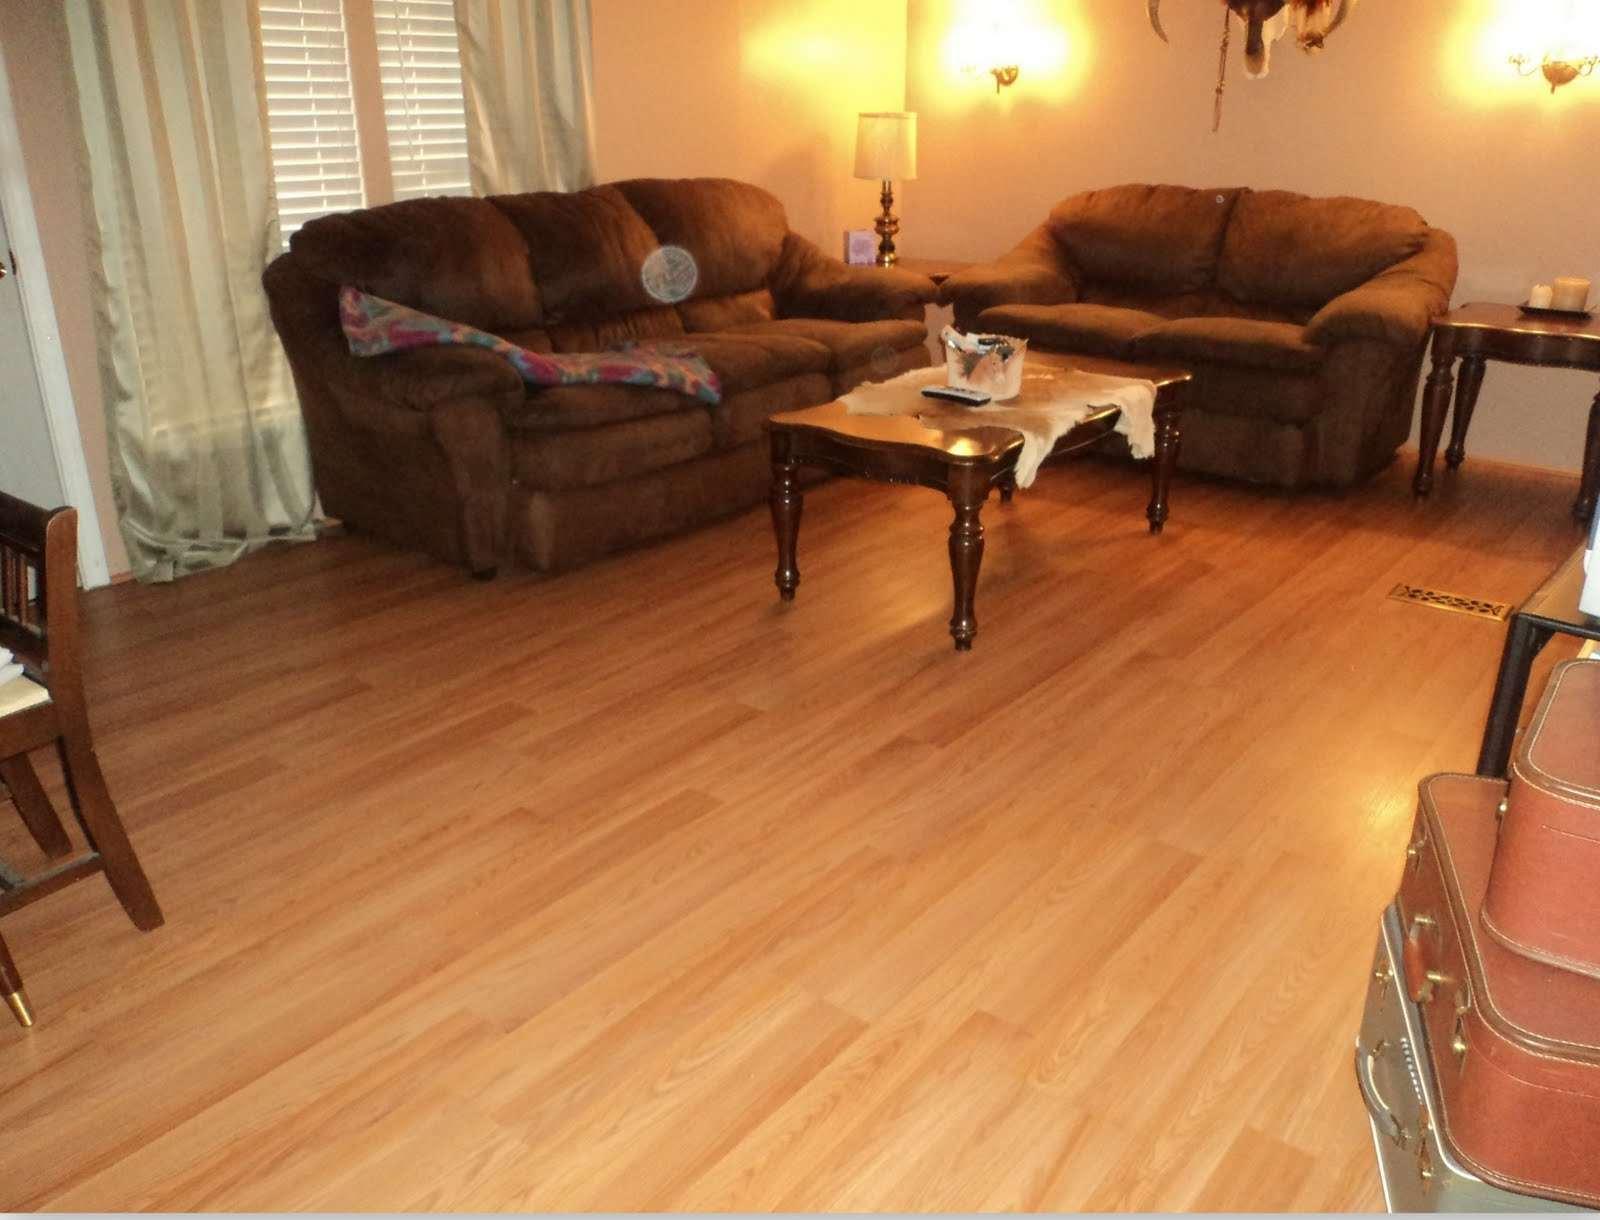 Living Room Hardwood Floor Ideas stunning hardwood flooring design ideas gallery - interior design